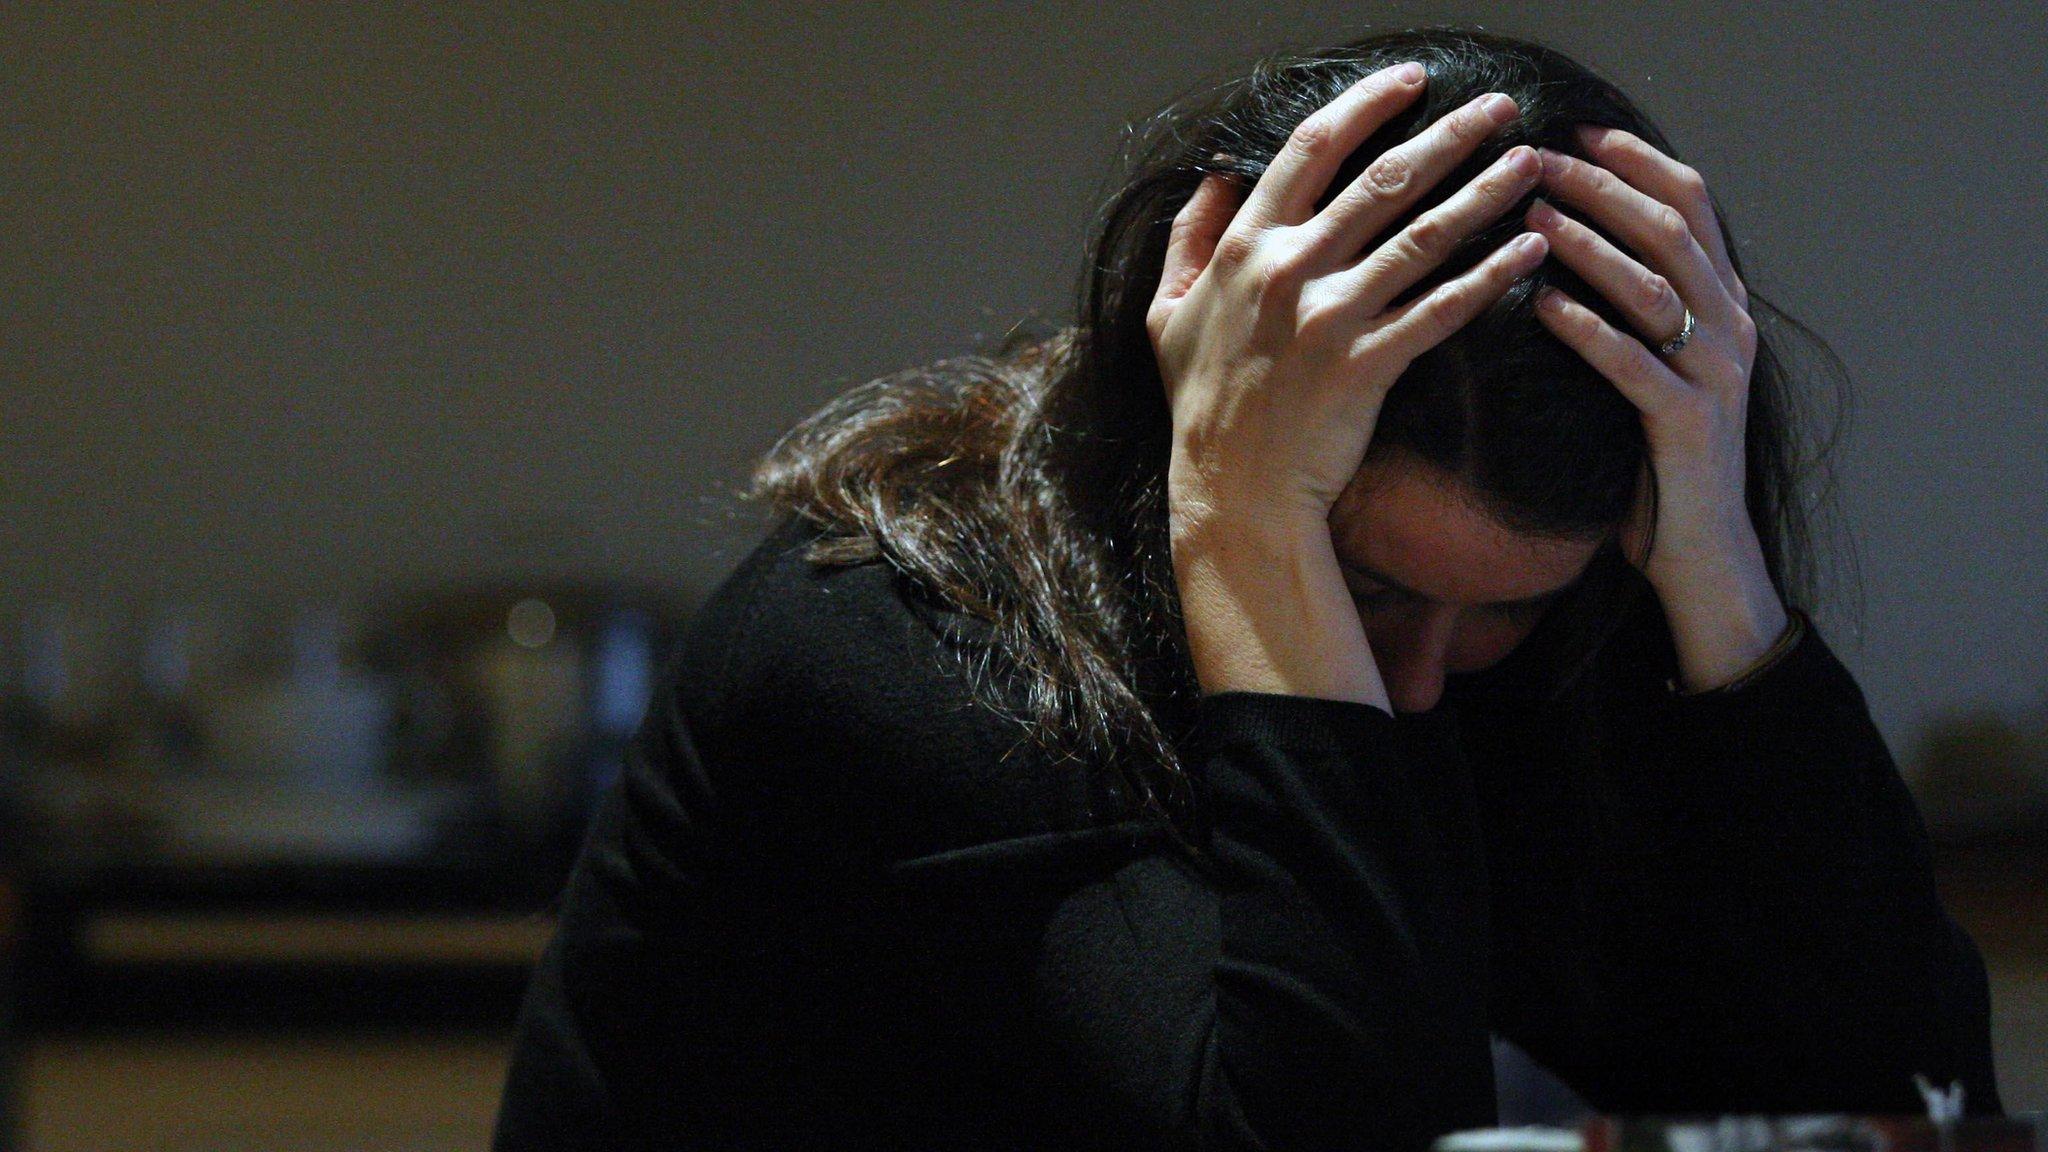 Legal costs halt thousands of domestic violence cases